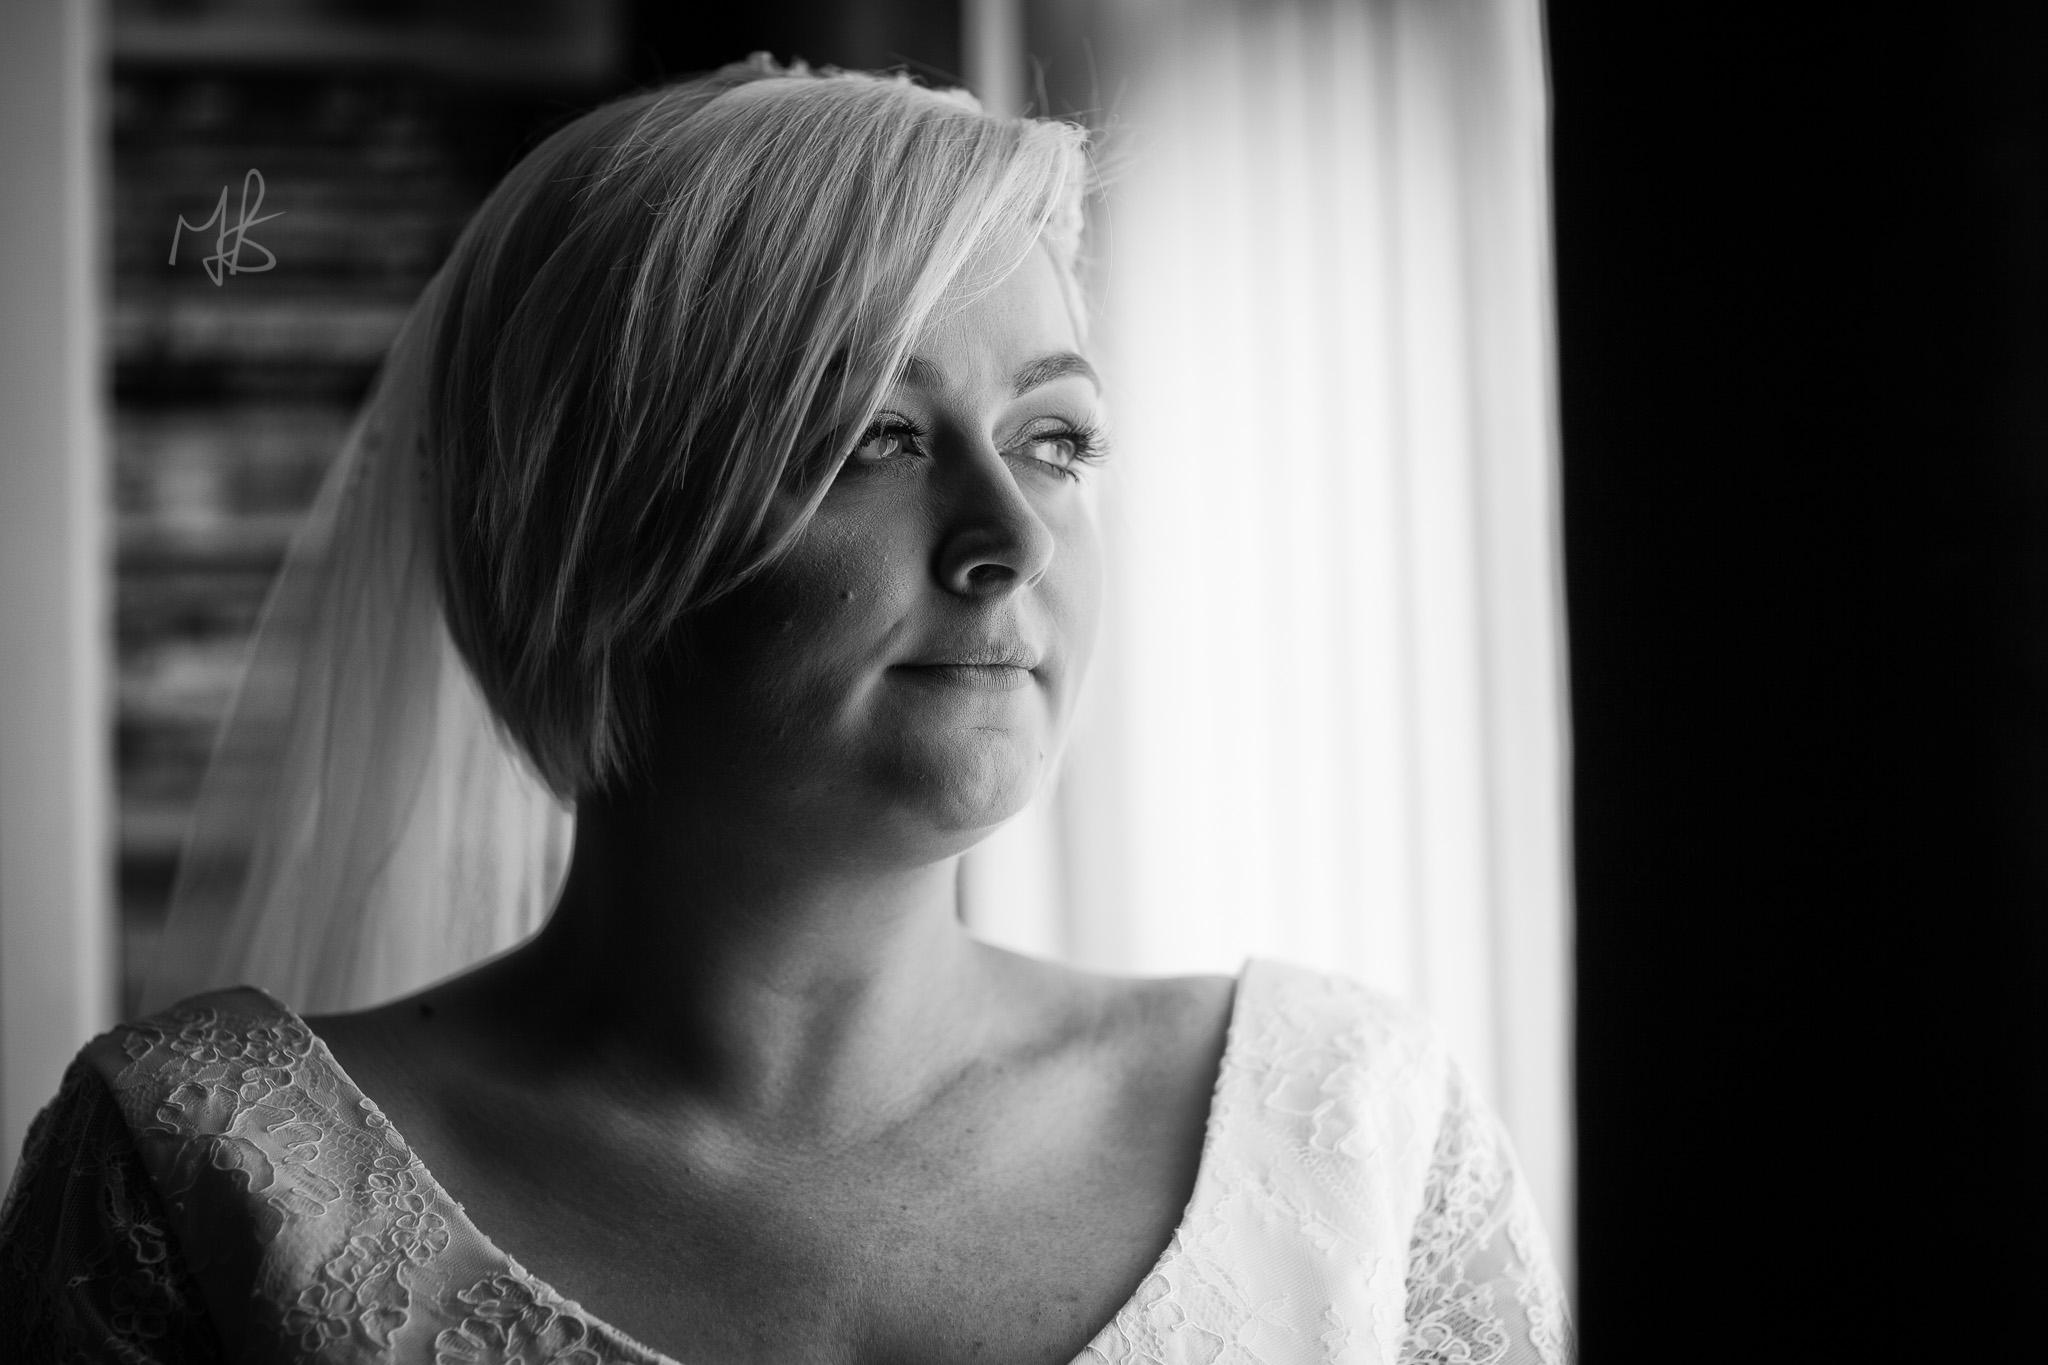 Northern-Ireland-Wedding-Photographer-Mark-Barnes-Ballymena_wedding-photography-Leighinmohr-House-Seamas_Alanna_For-web-12.jpg